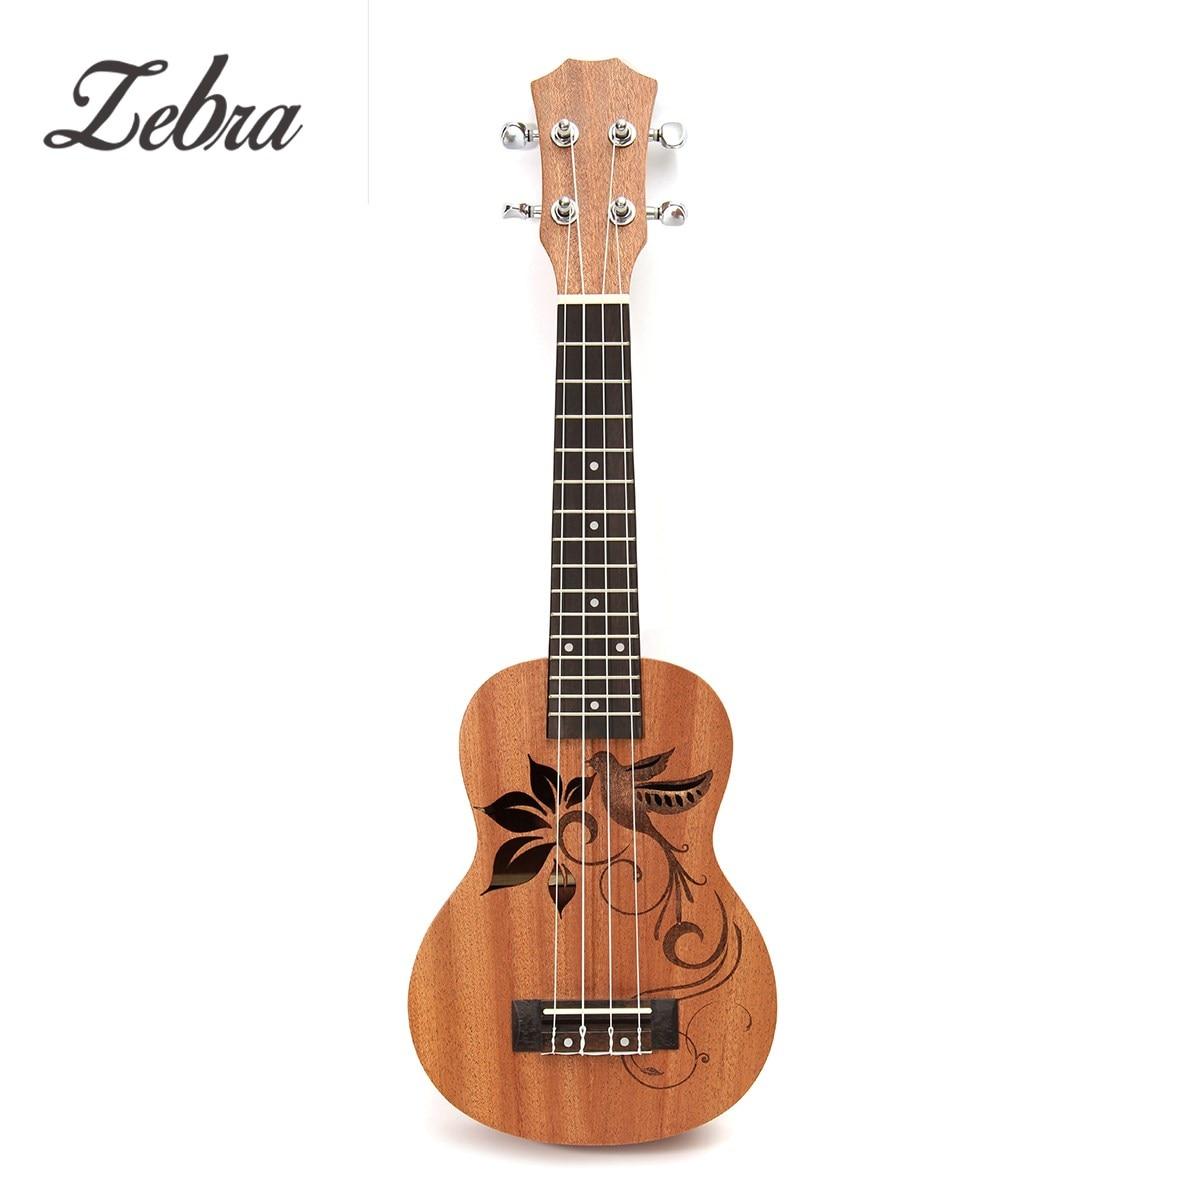 Zebra 21 Inch Soprano Sapele Mini Ukulele Uke 15 Frets 4 Strings Bird Flower Pattern Wood Guitar Universal Musical Instruments